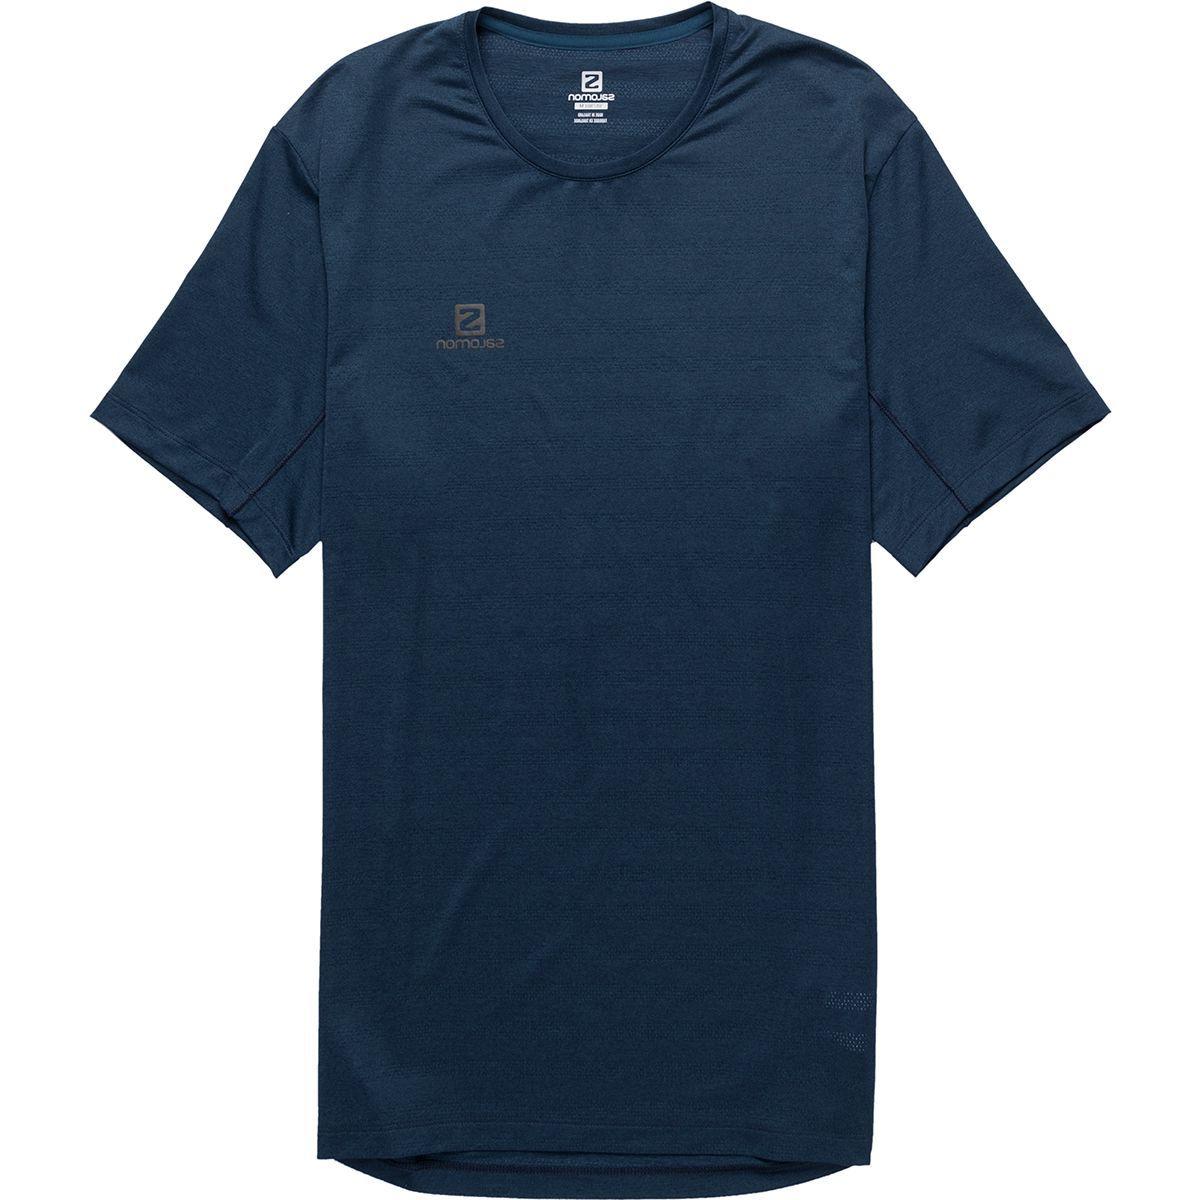 Salomon XA Short-Sleeve T-Shirt - Men's